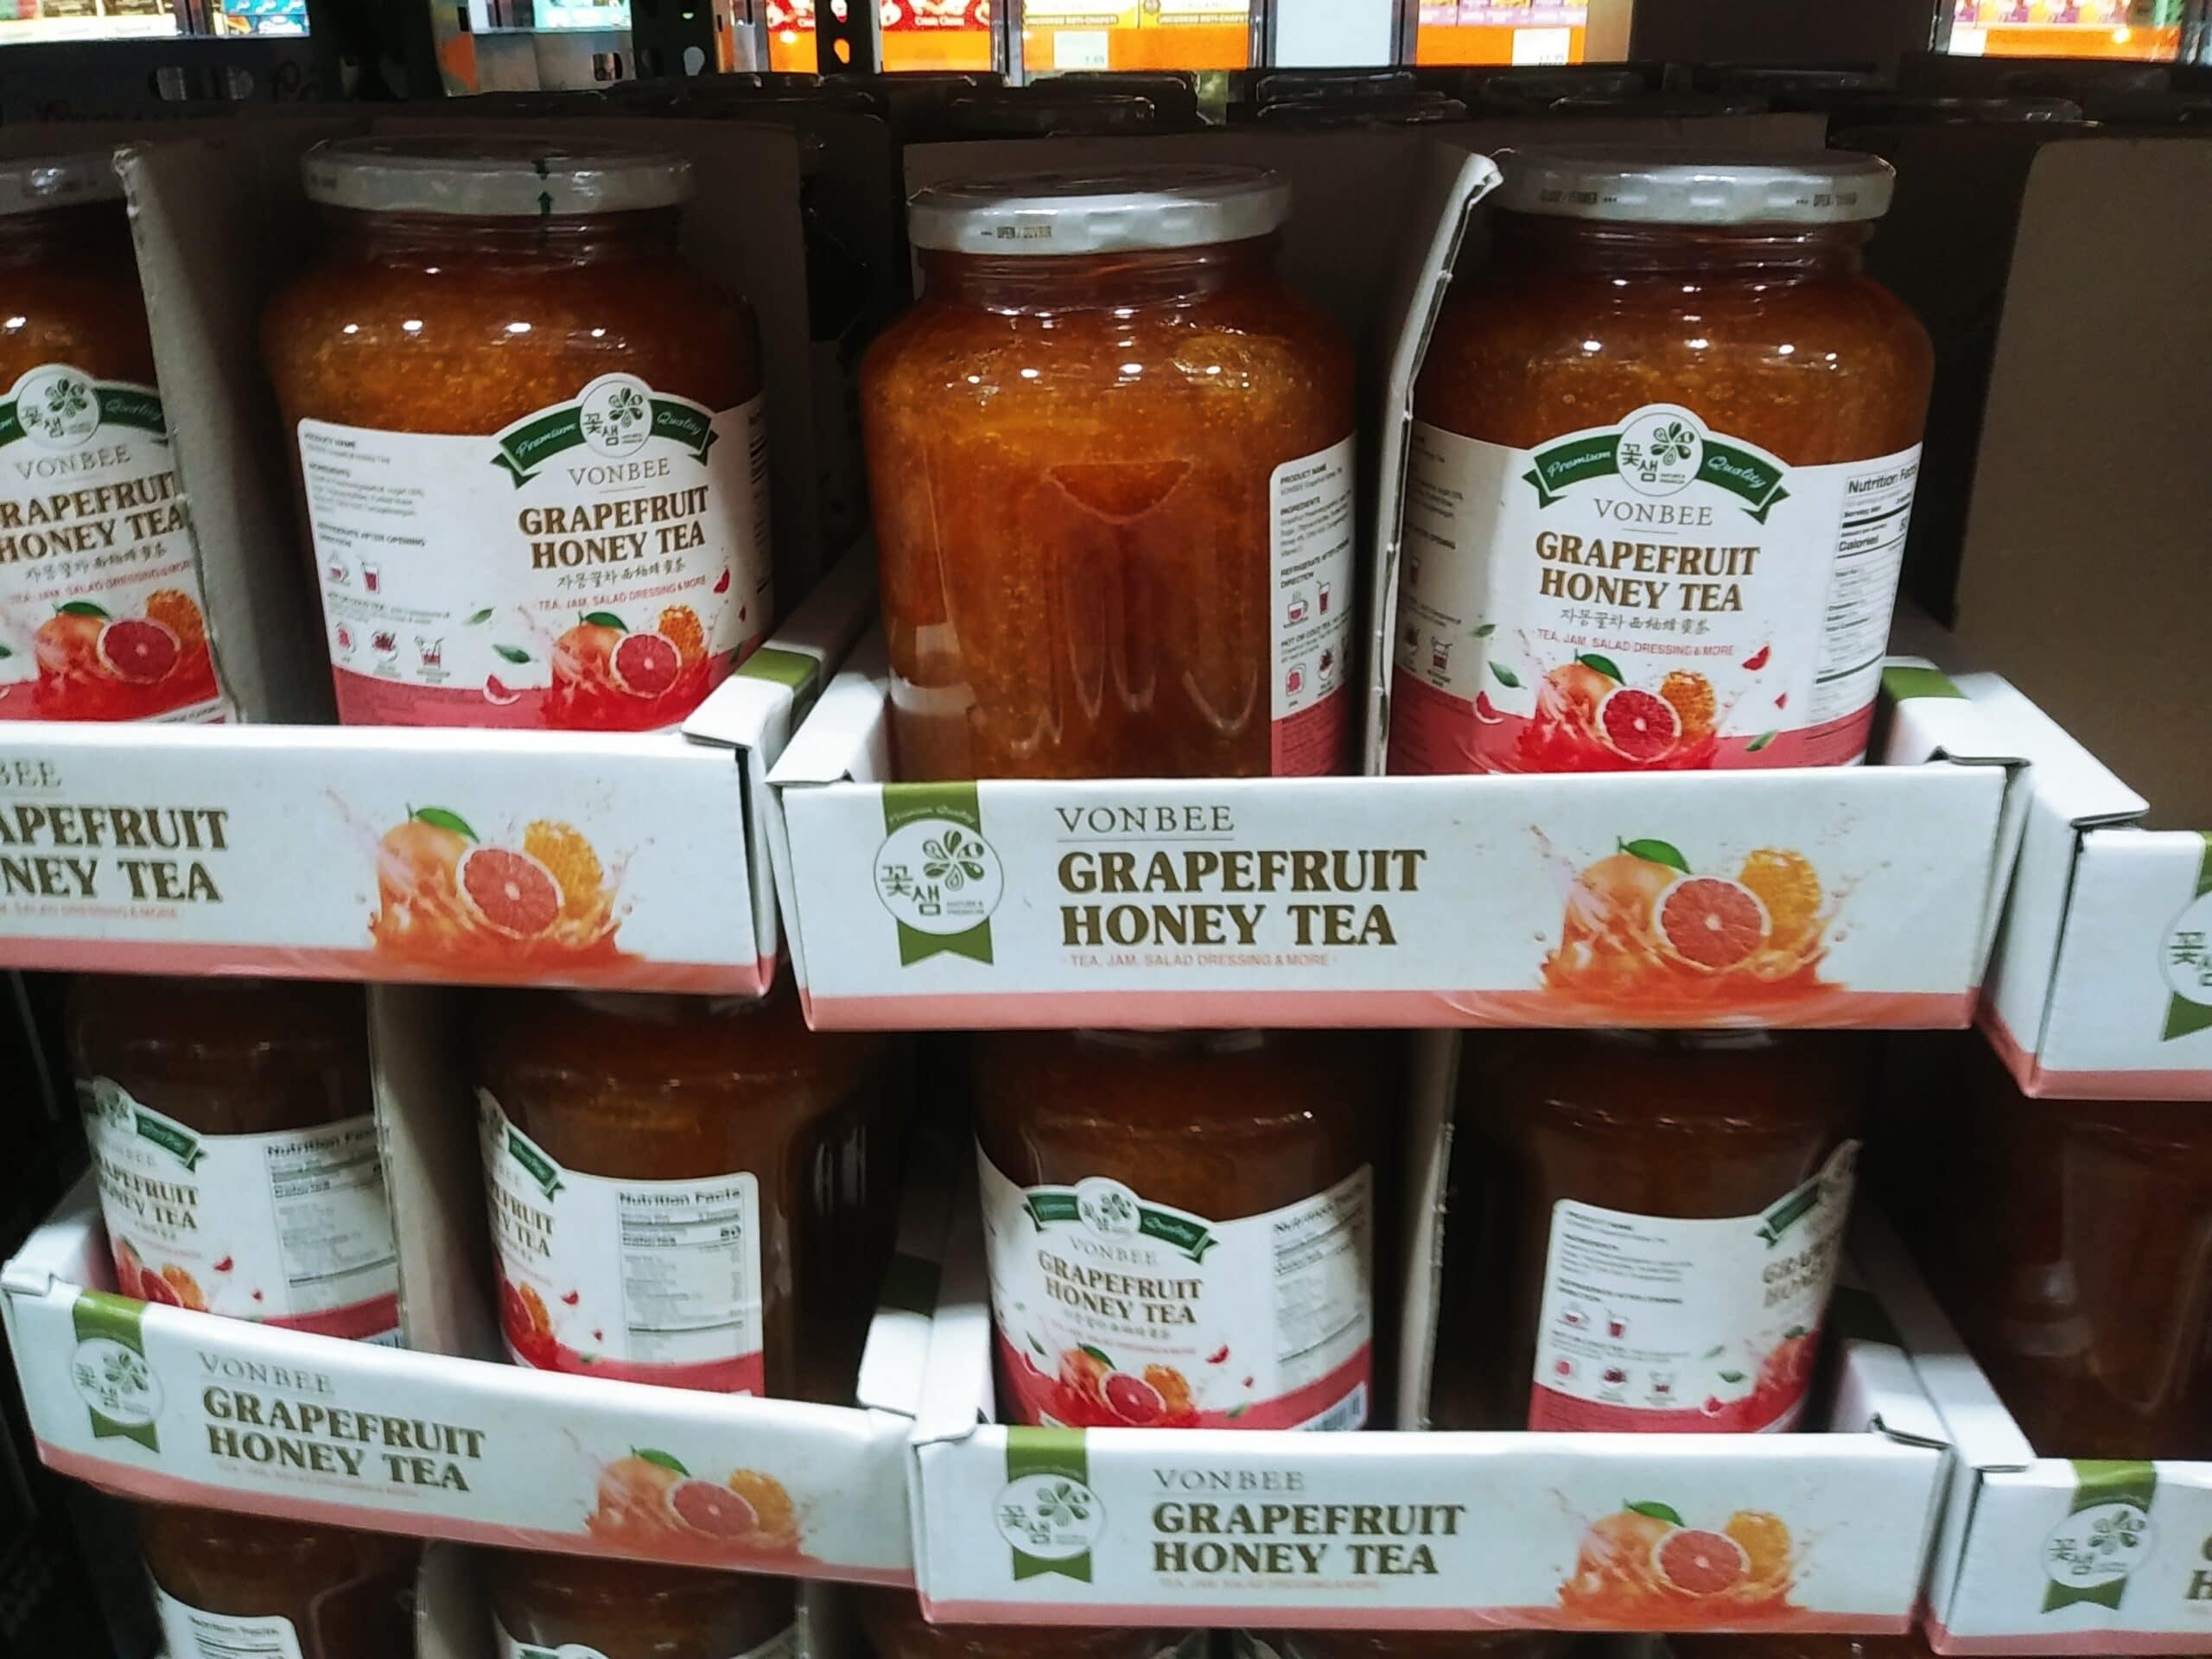 Grapefruit Honey Tea $6.69